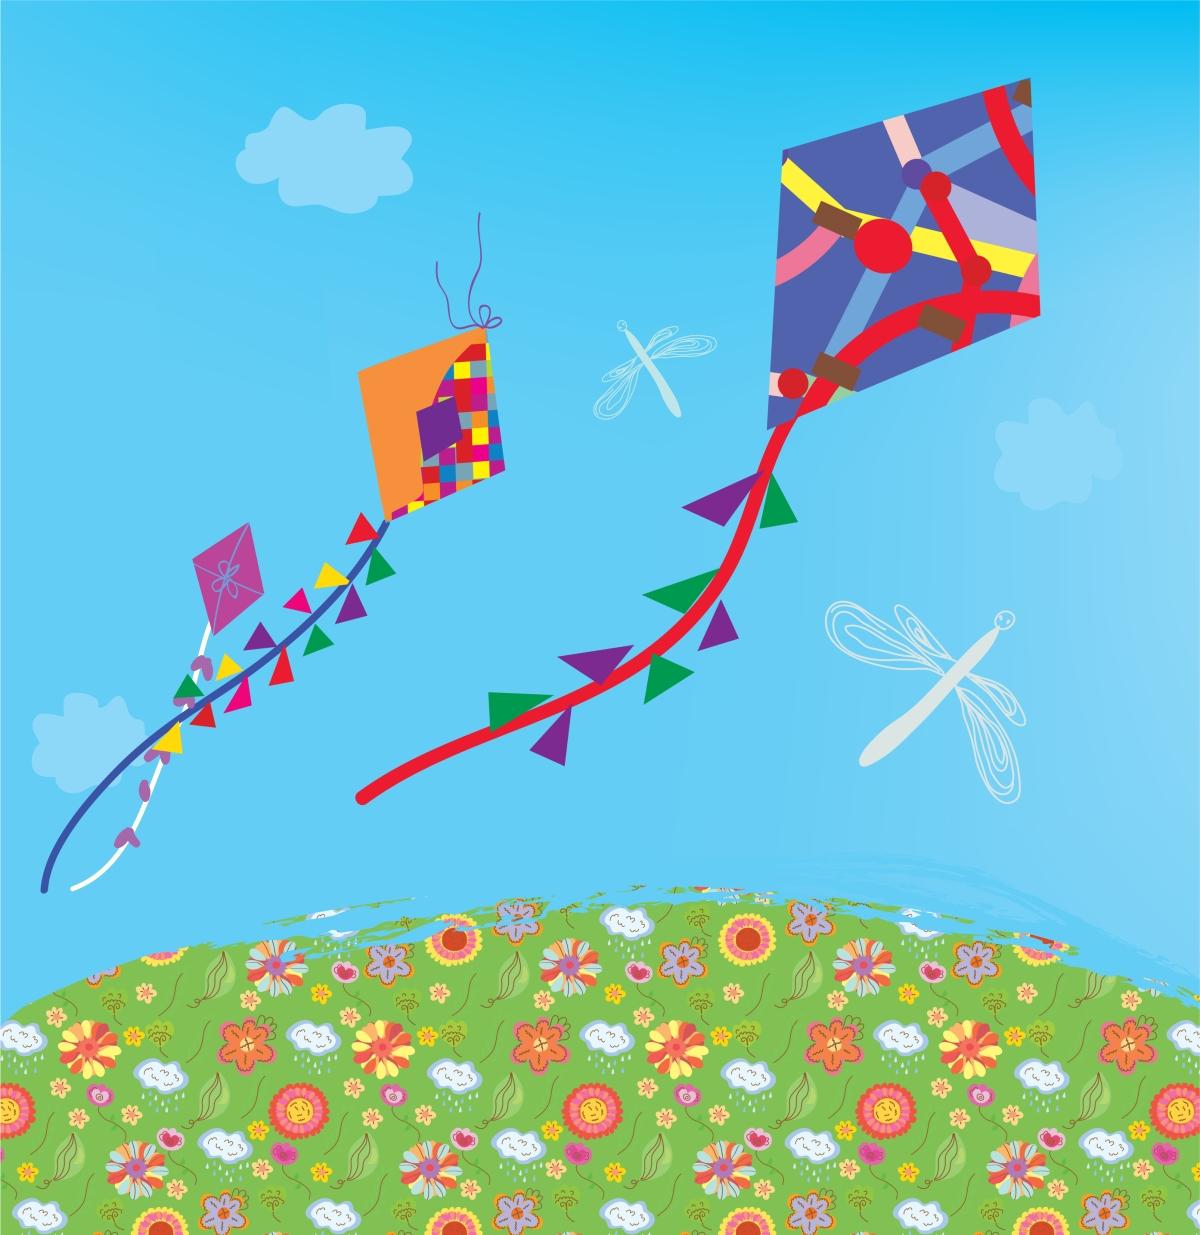 … kites across thesky